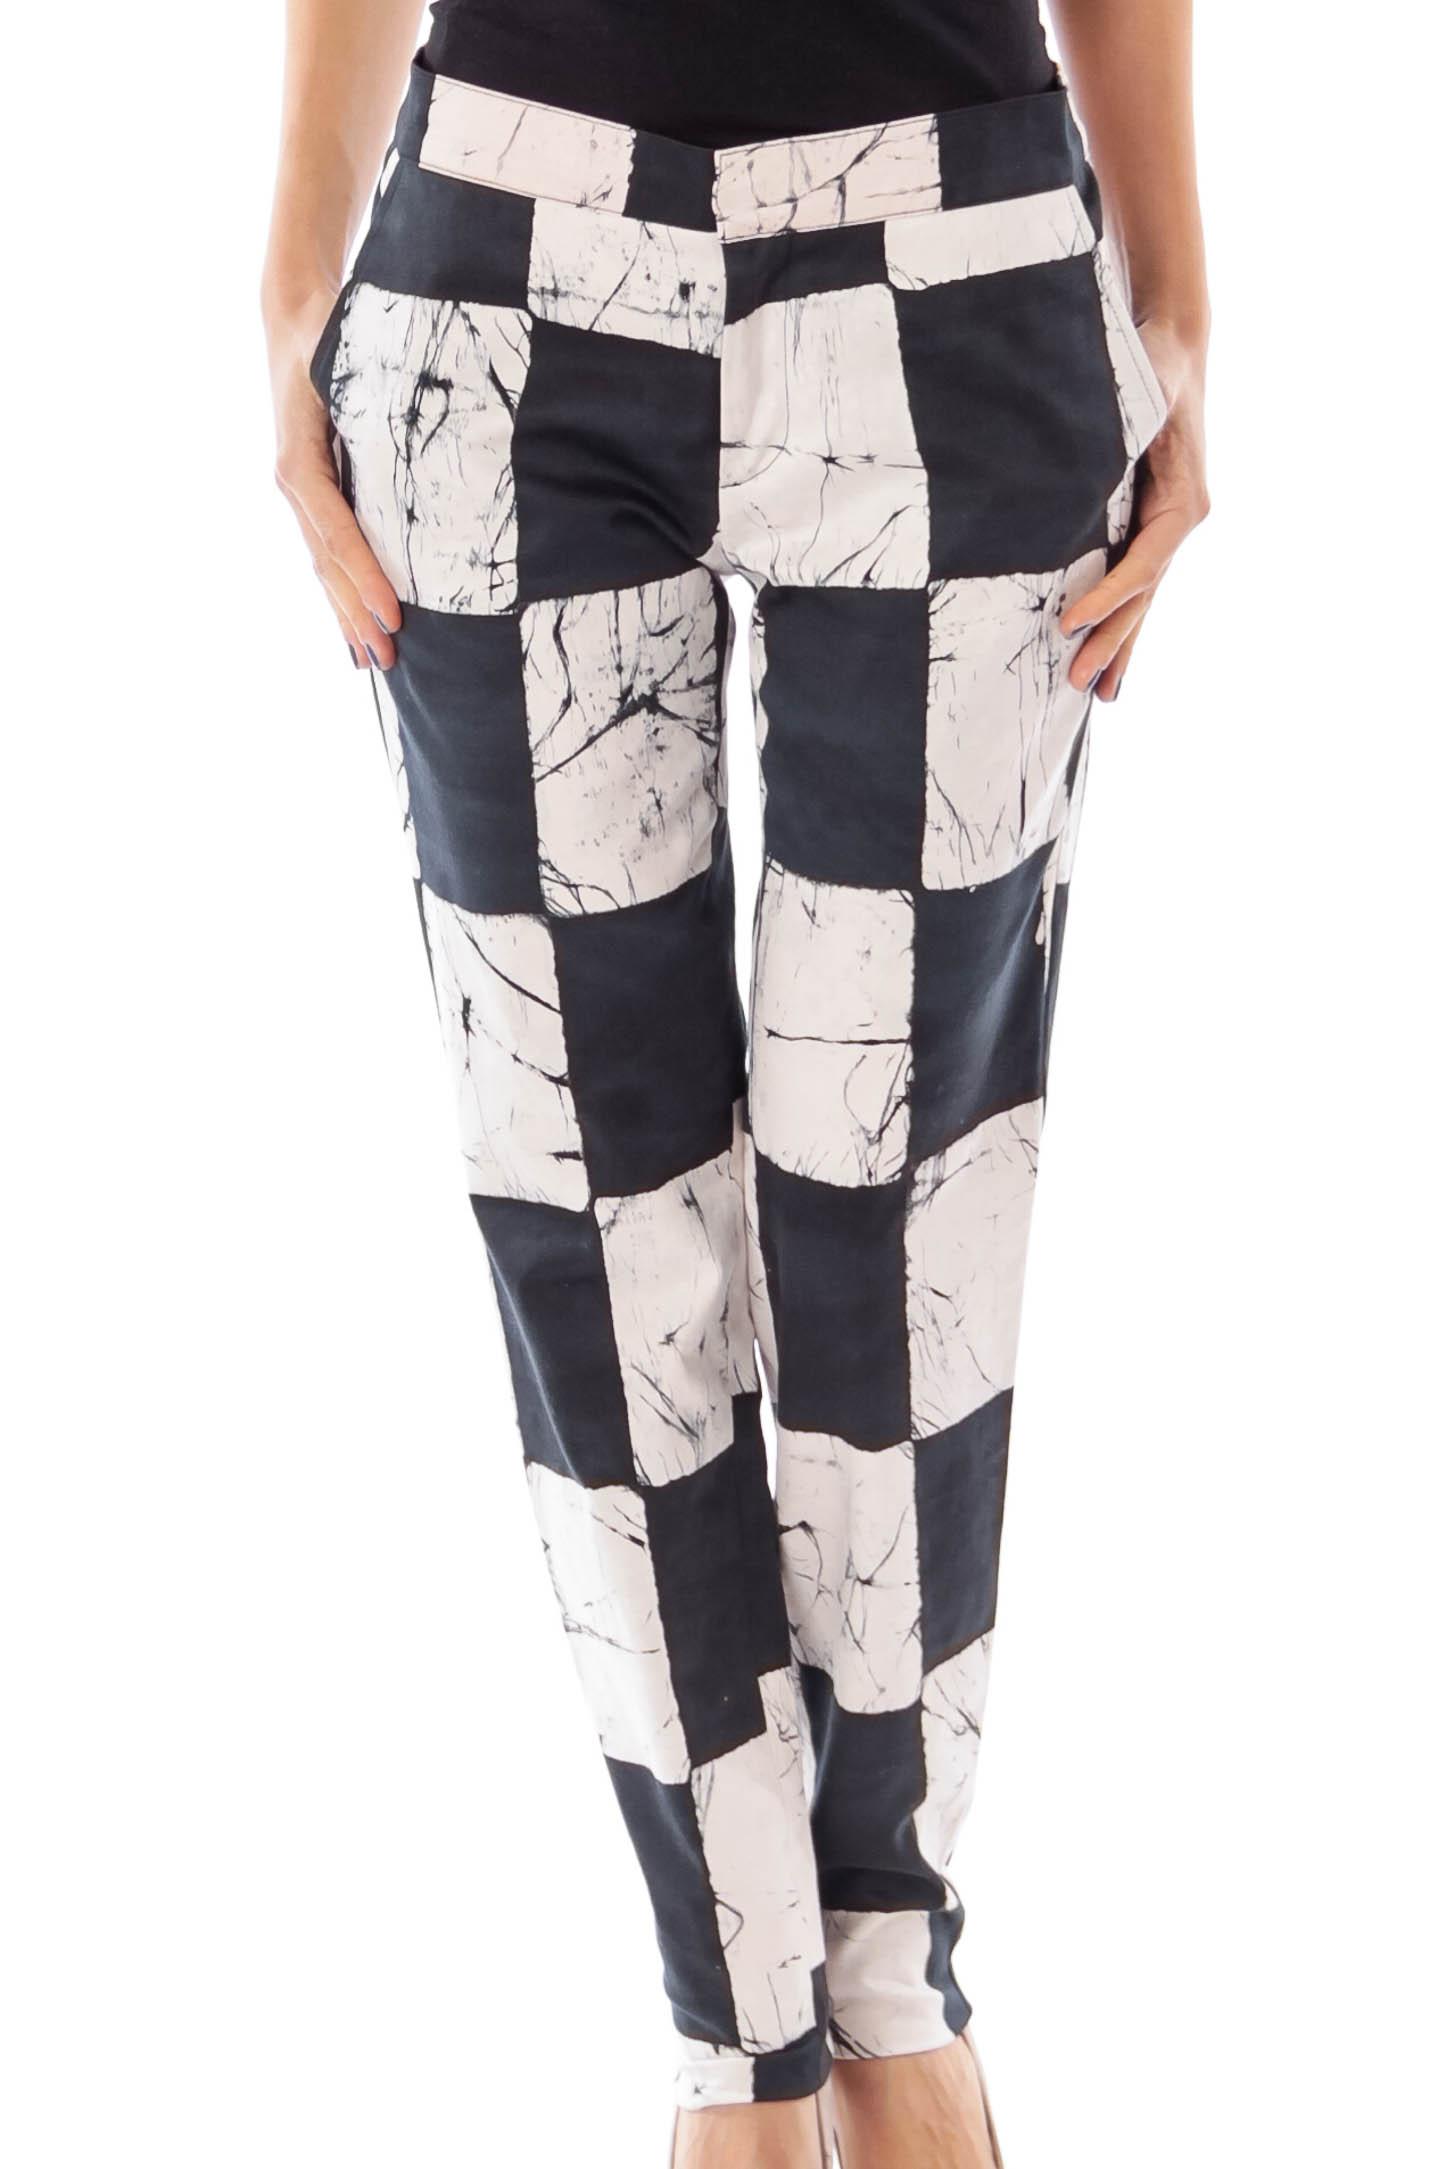 Black & White Block Skinny Pants